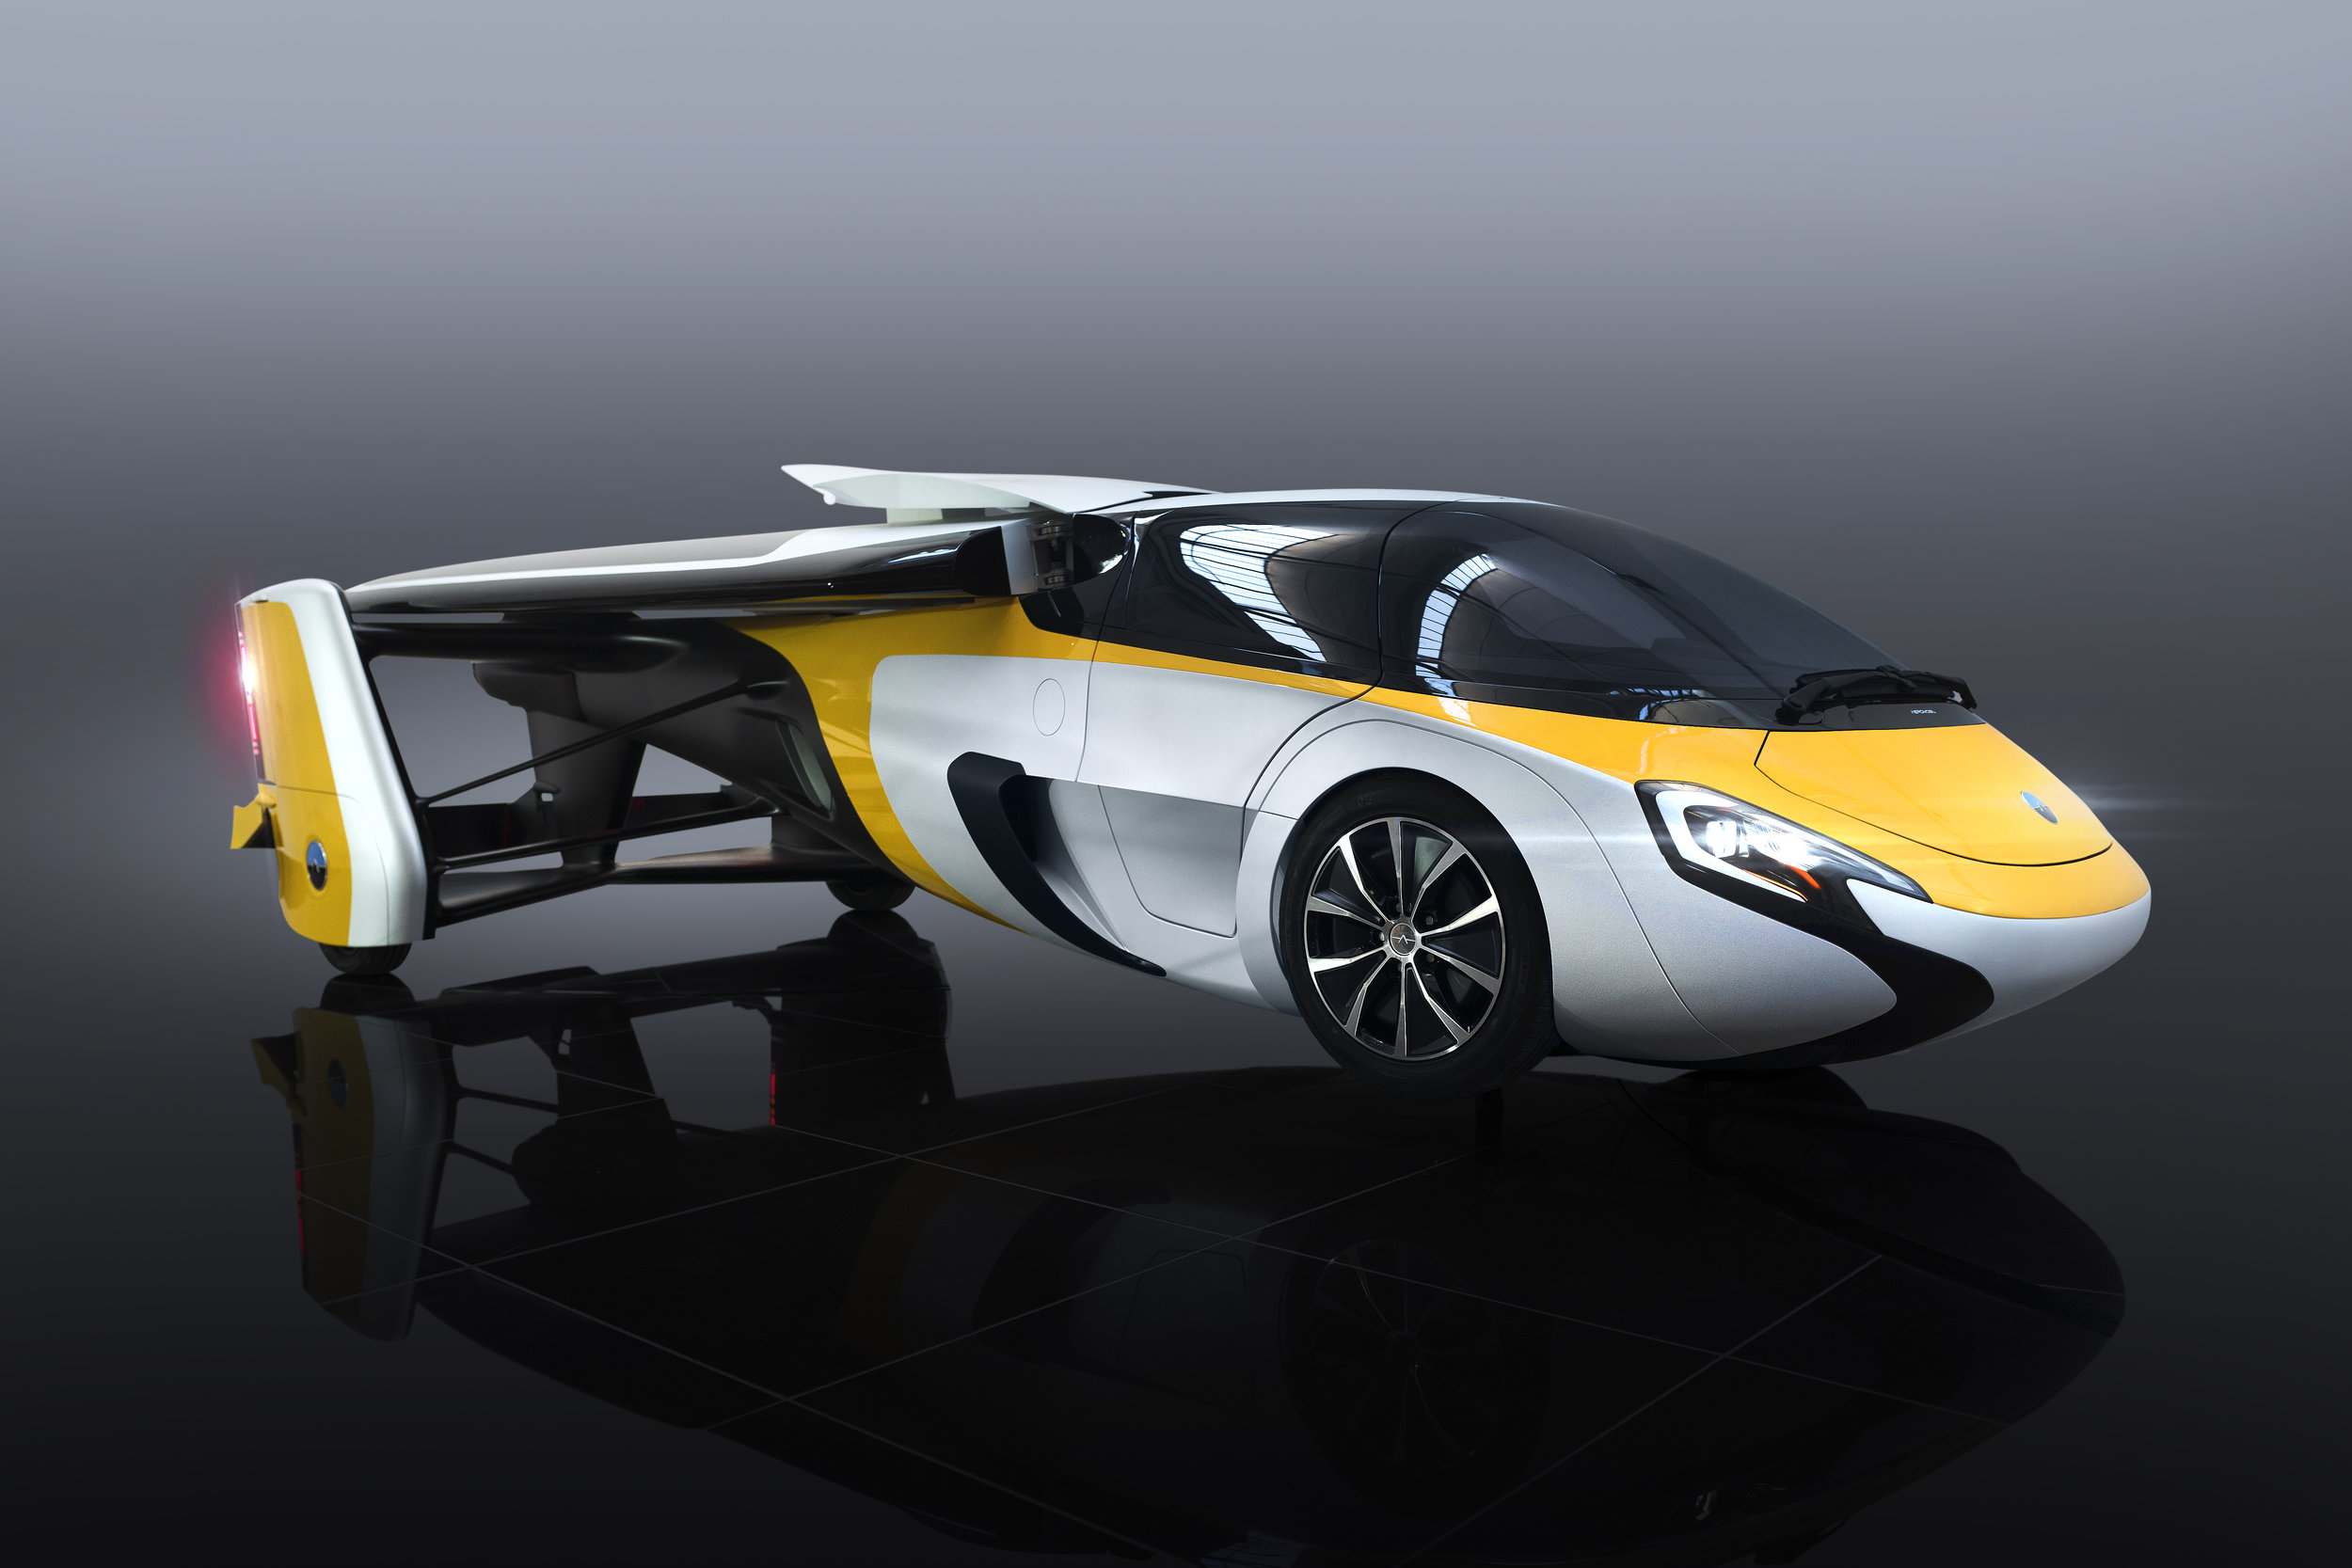 AeroMobil_4.0_STOL_Car_Configuration_Studio_Dark_Background.jpg